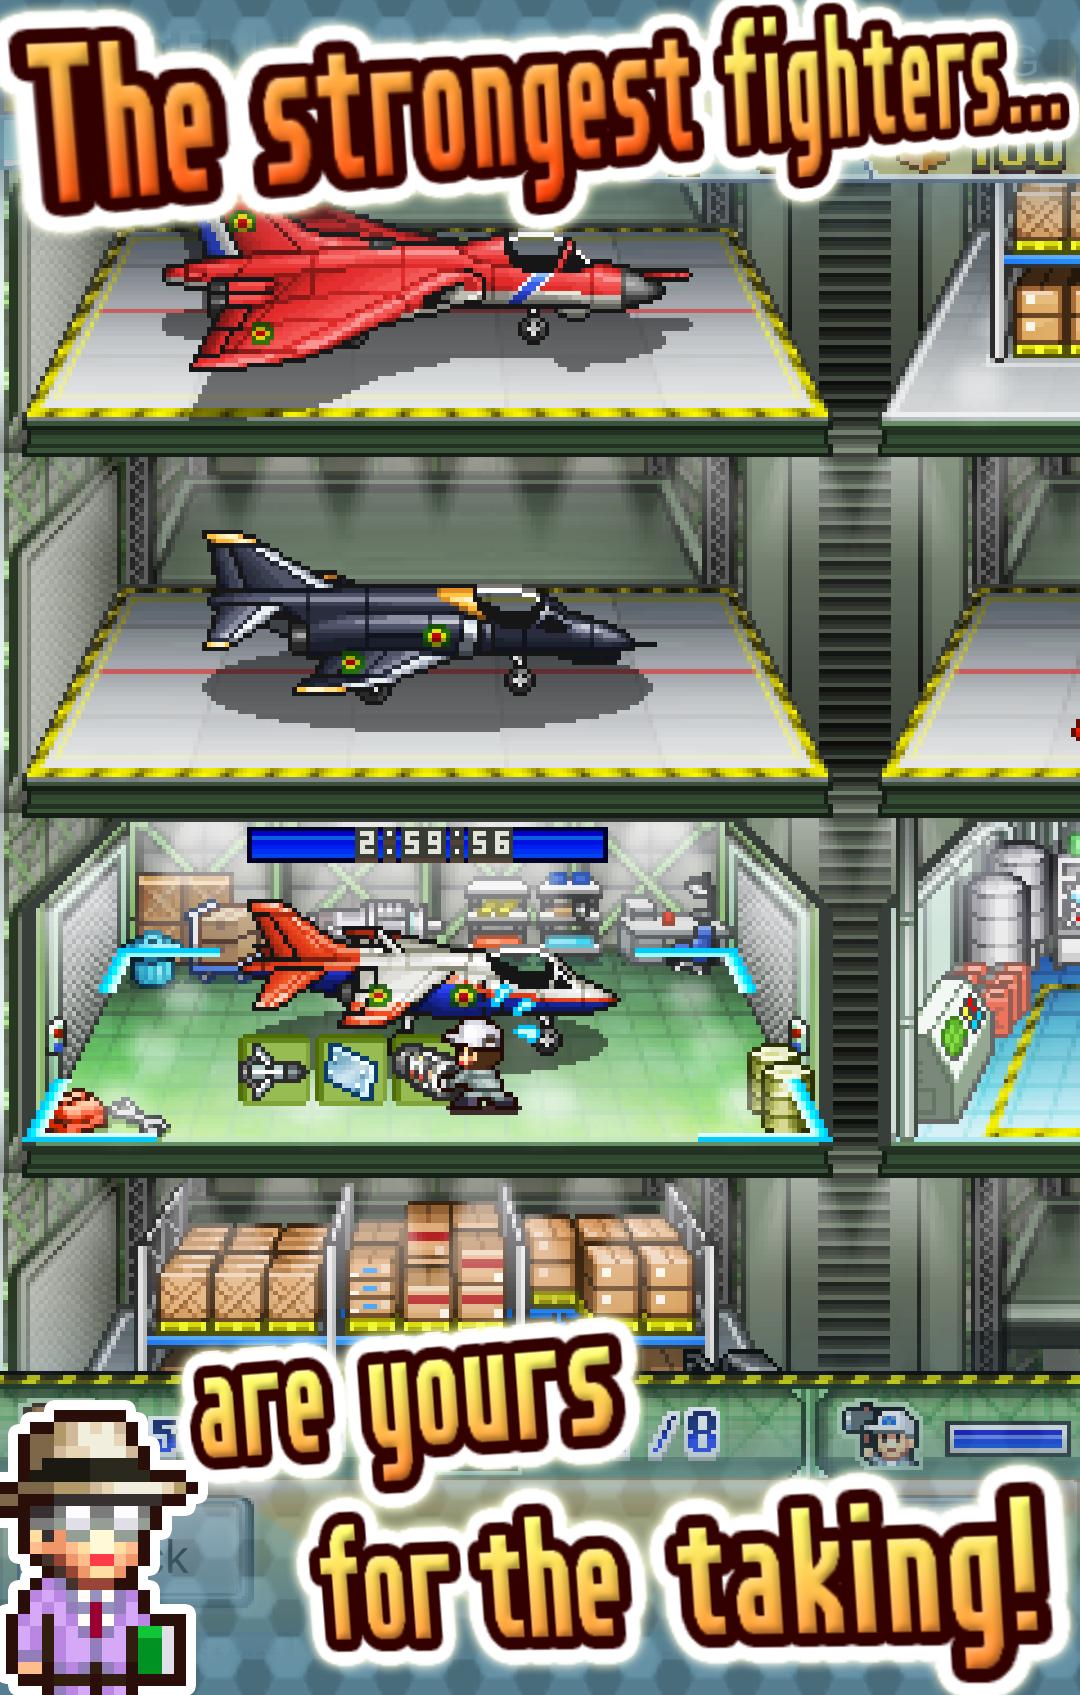 Skyforce Unite! screenshot #2